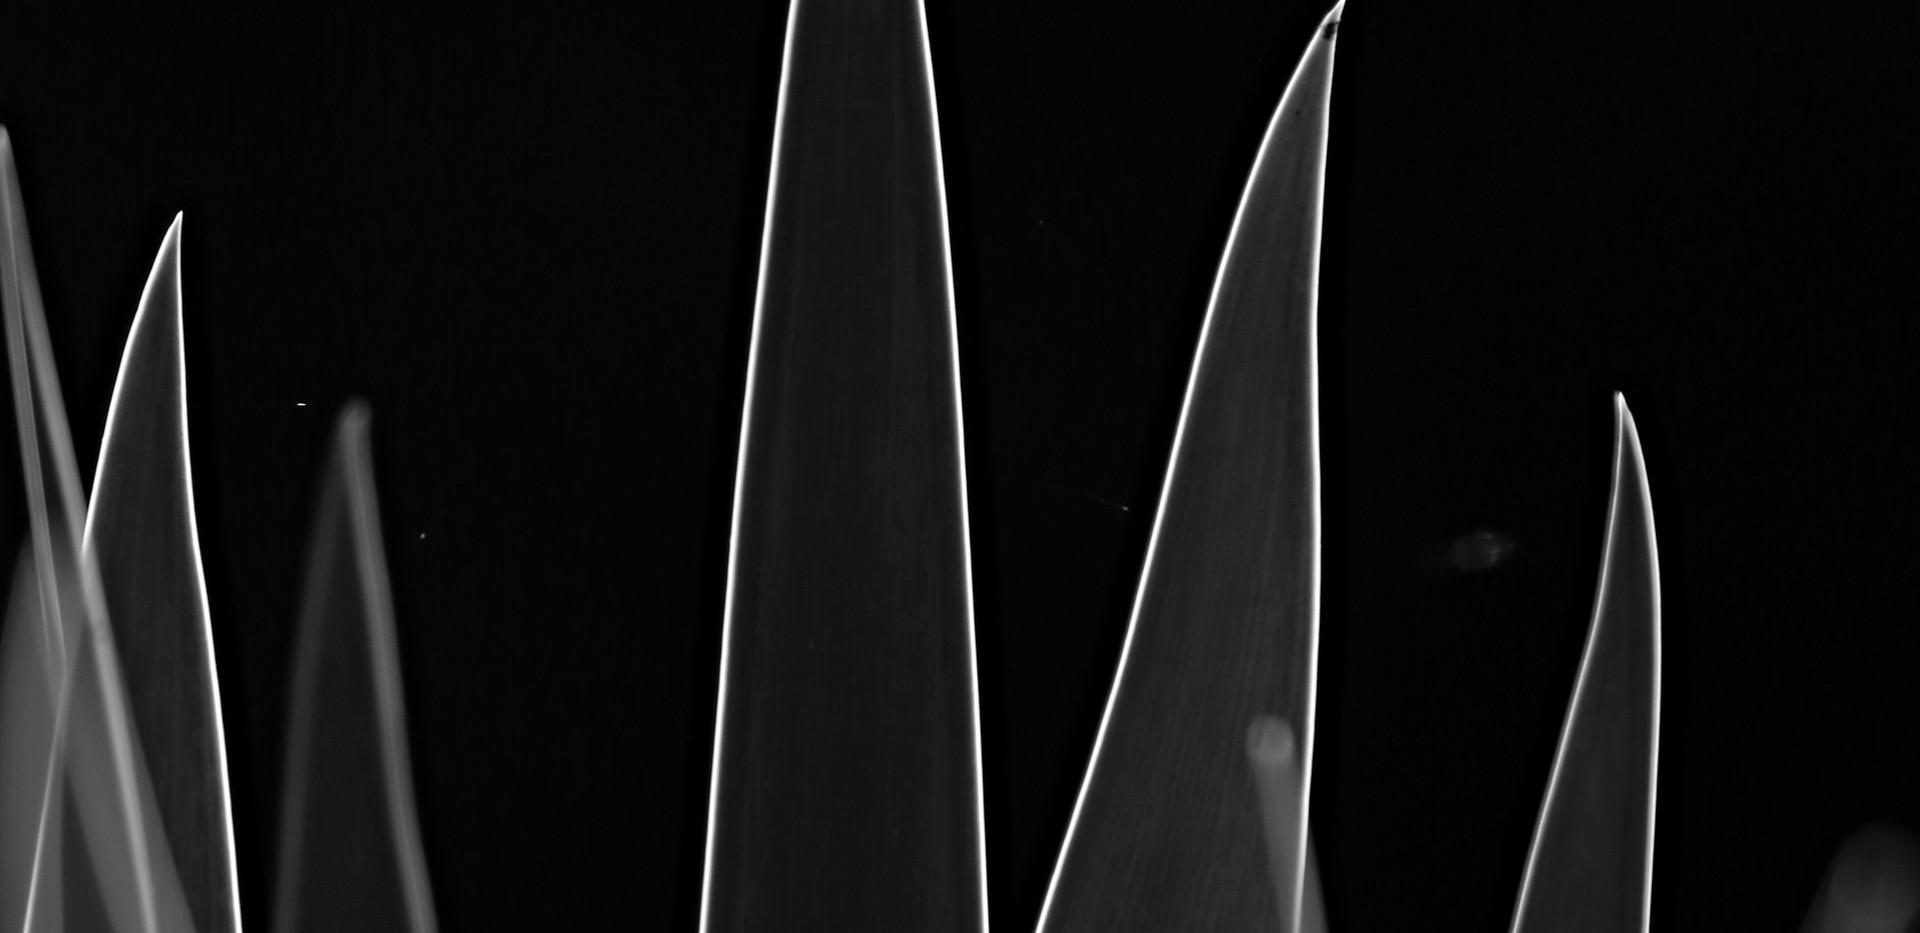 PKL Leaves by Sian Hawkins